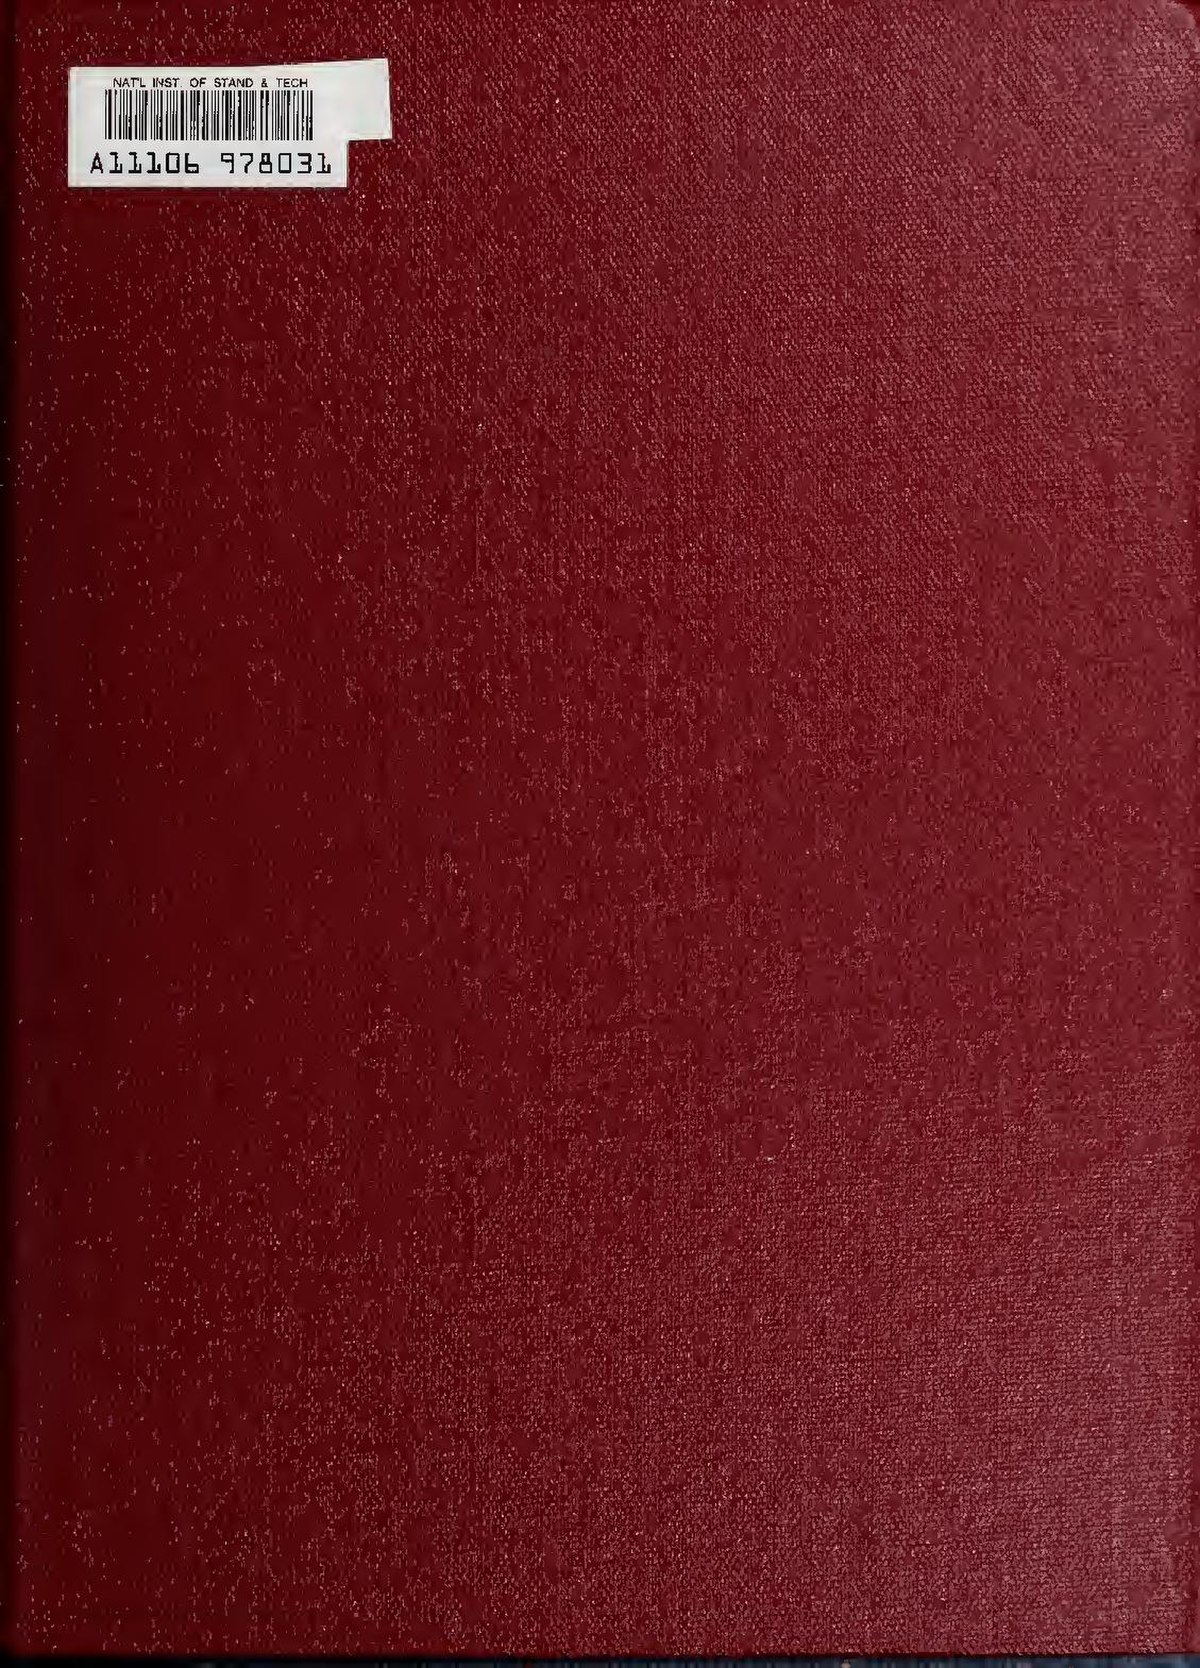 File:NBS minimal BASIC test programs - Version 2, user's manual ...